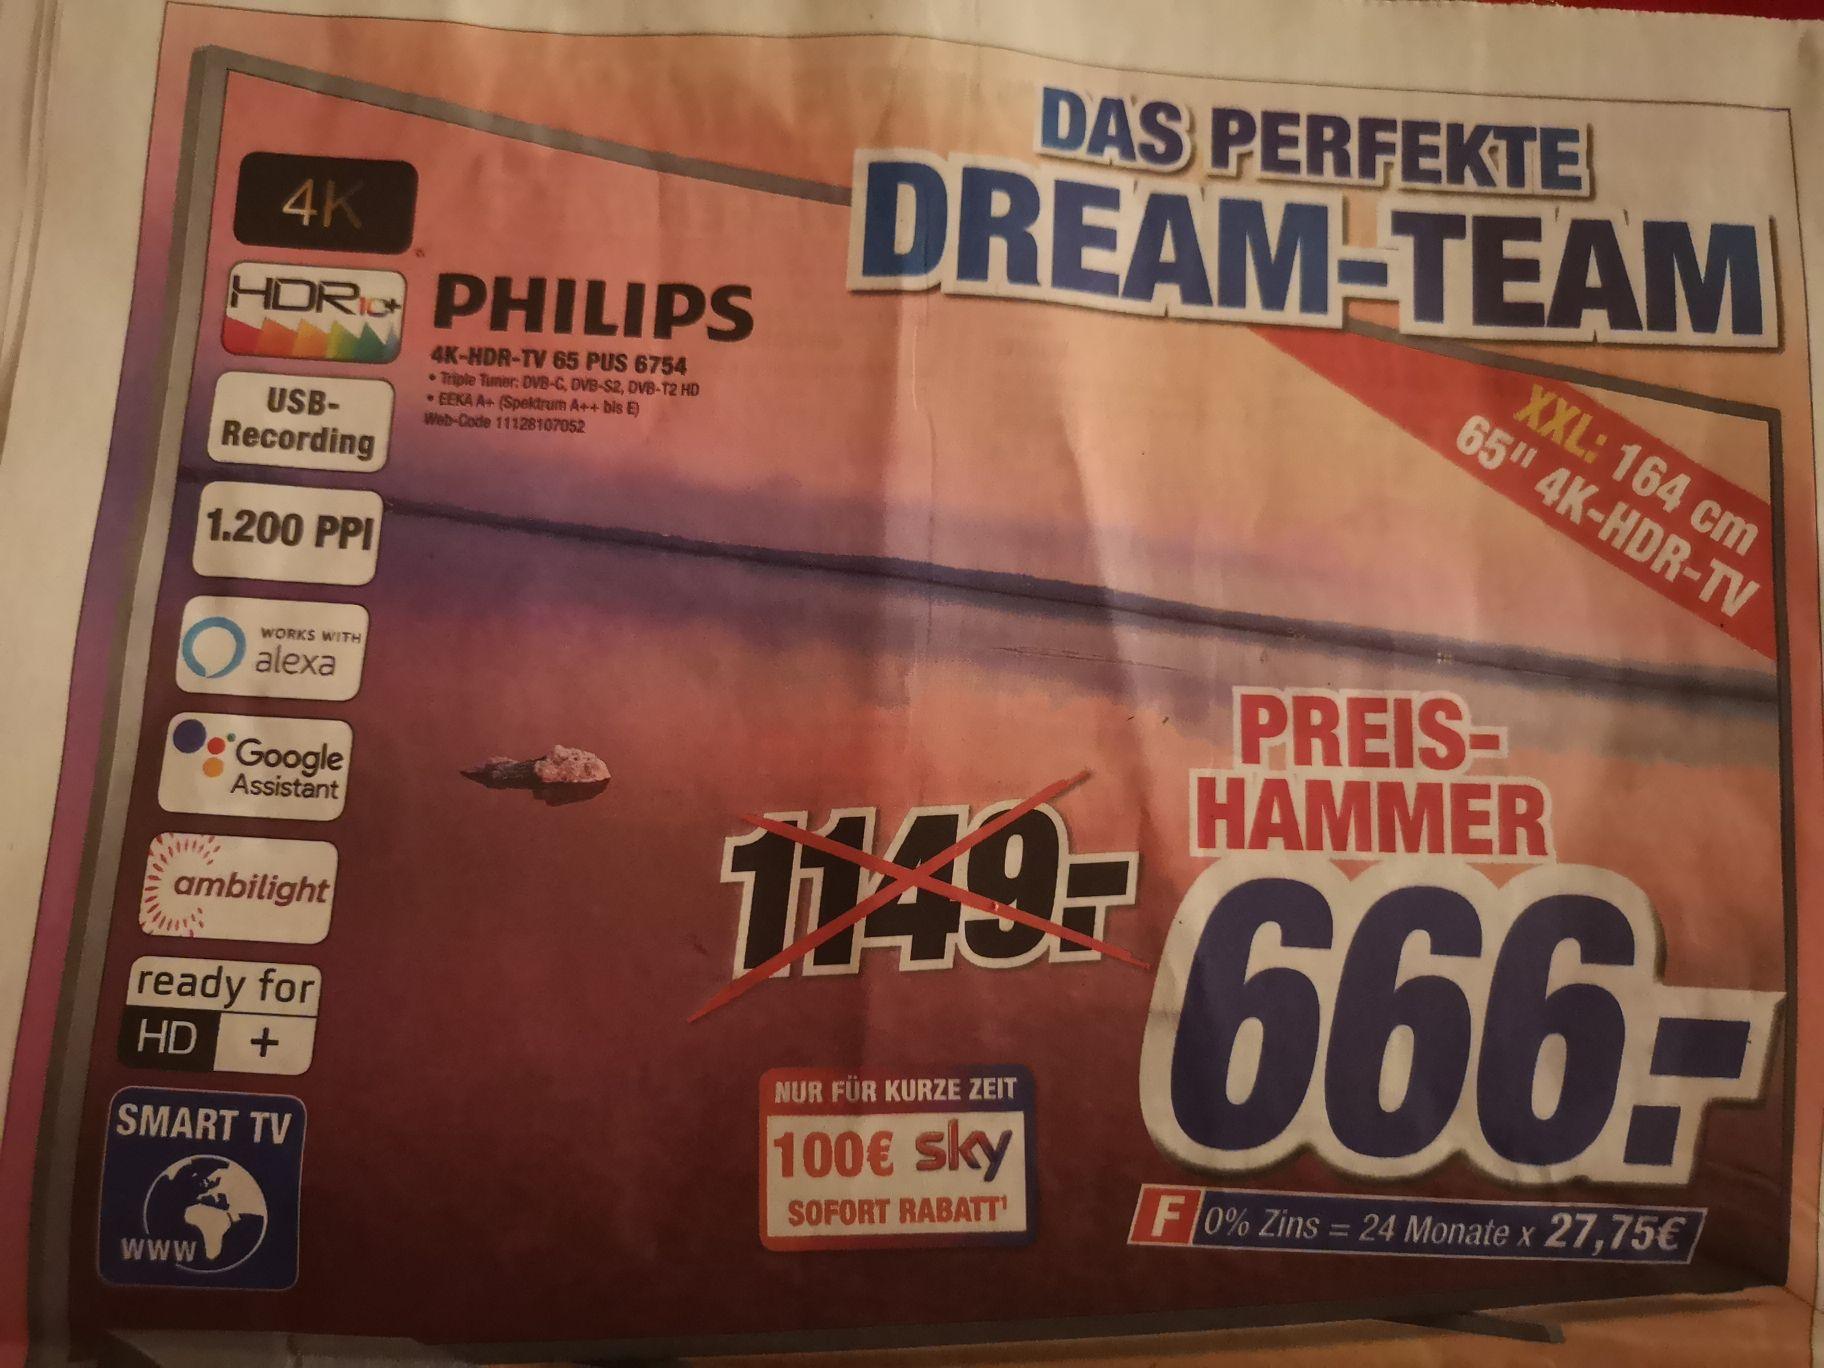 PHILIPS 4K-HDR-TV 65 PUS 6754 || Expert Klein